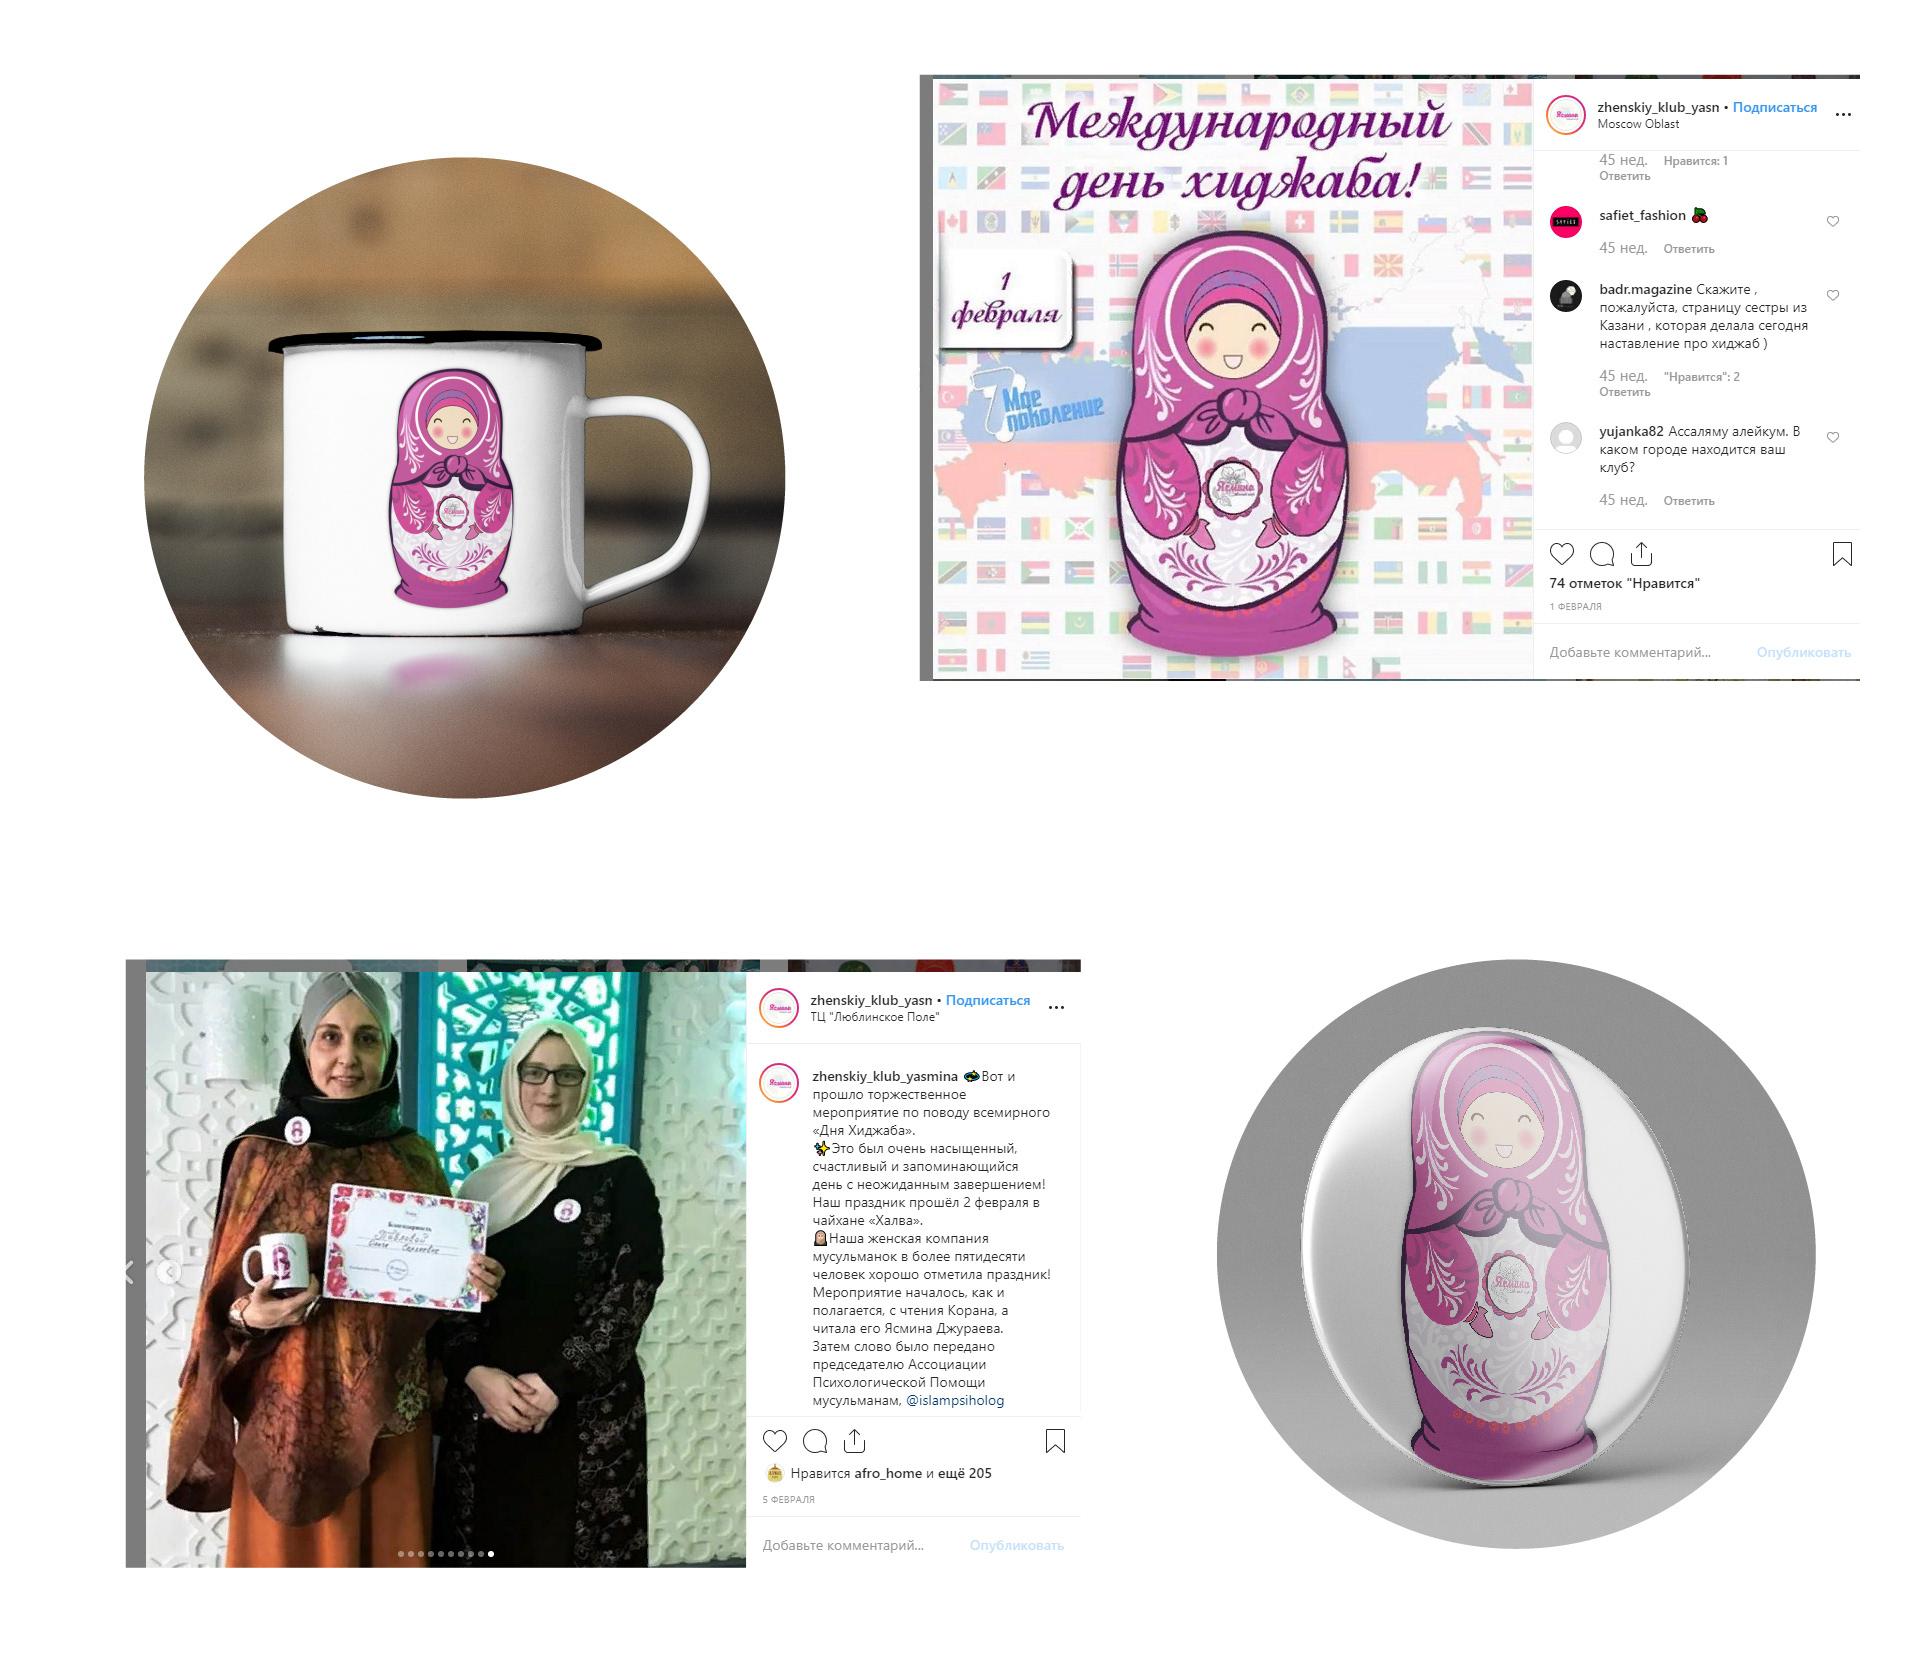 Anastasia Sergeyeva search projects | photos, videos, logos, illustrations and